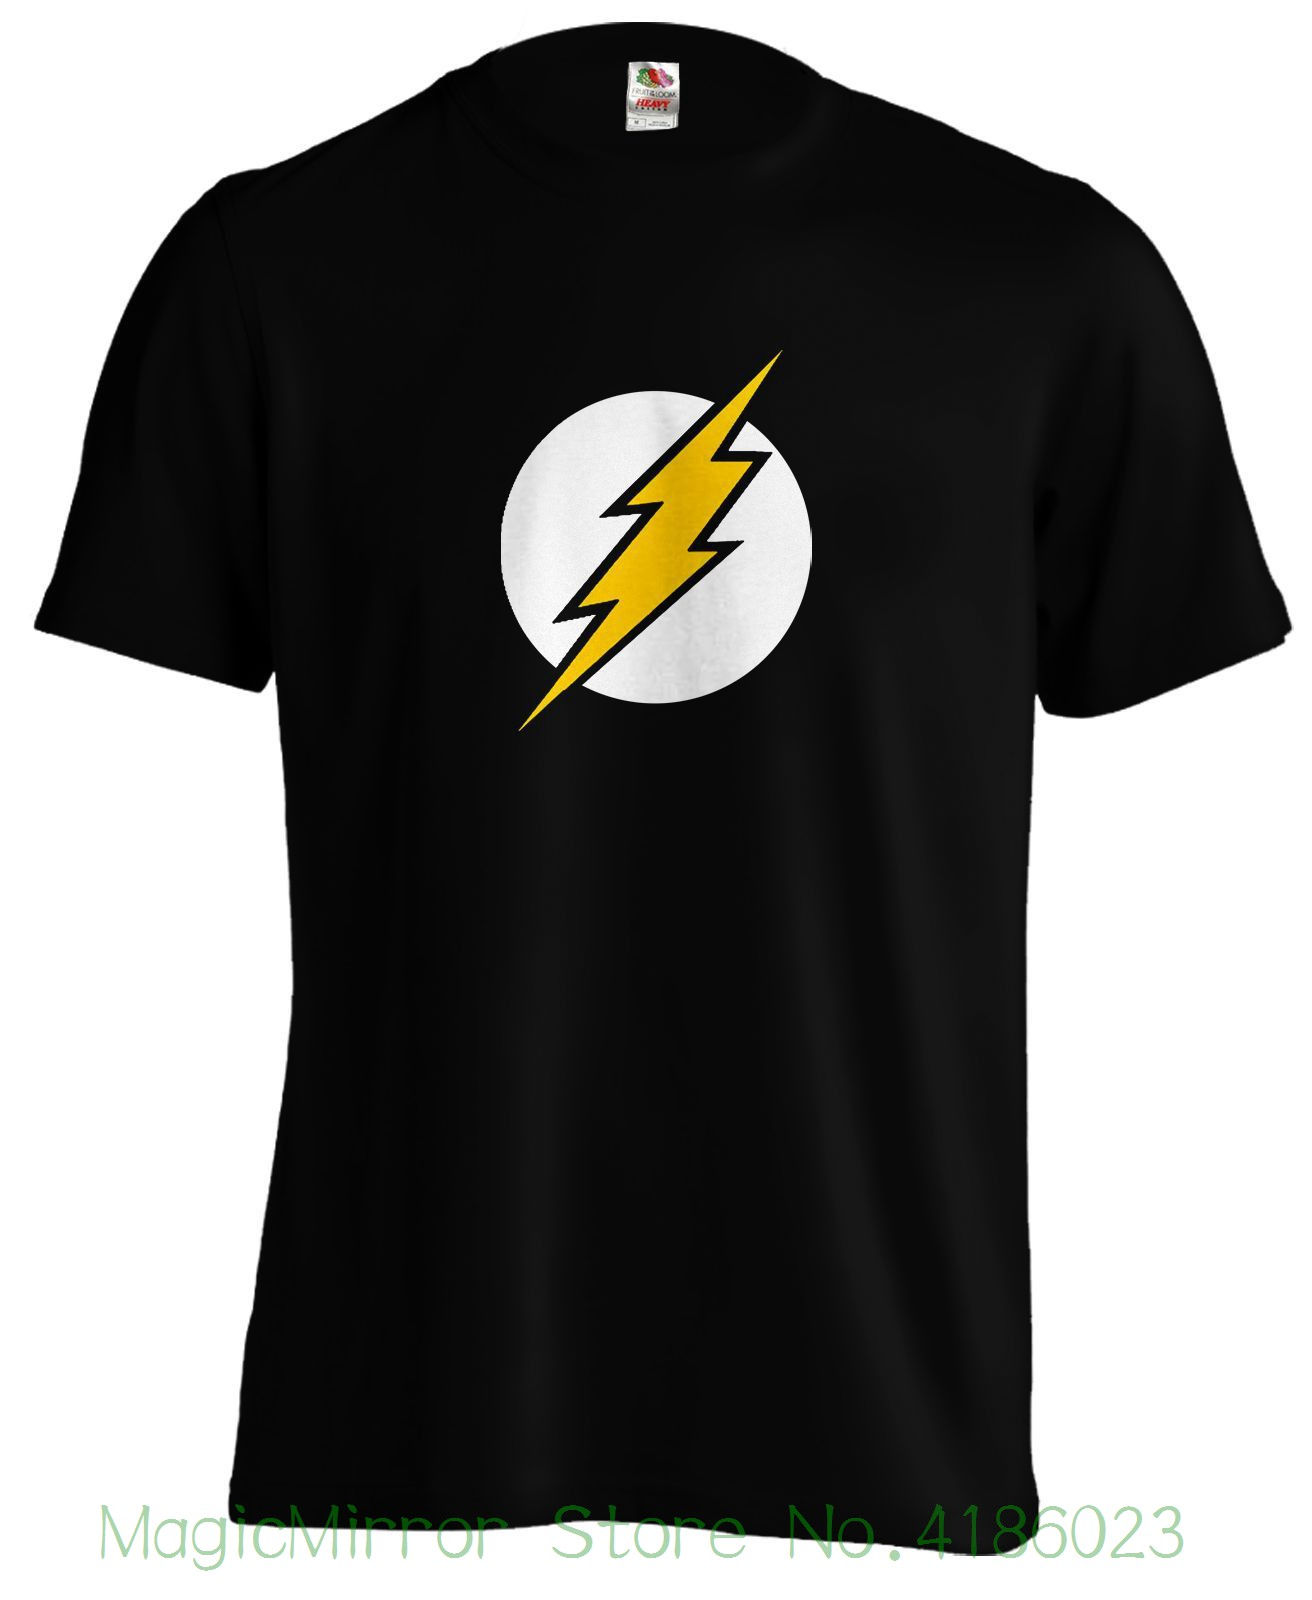 The Flash Comic Geek T-shirt Tee Xmas Christmas Gift Birthday Hip Hop Novelty T Shirts Mens Brand Clothing